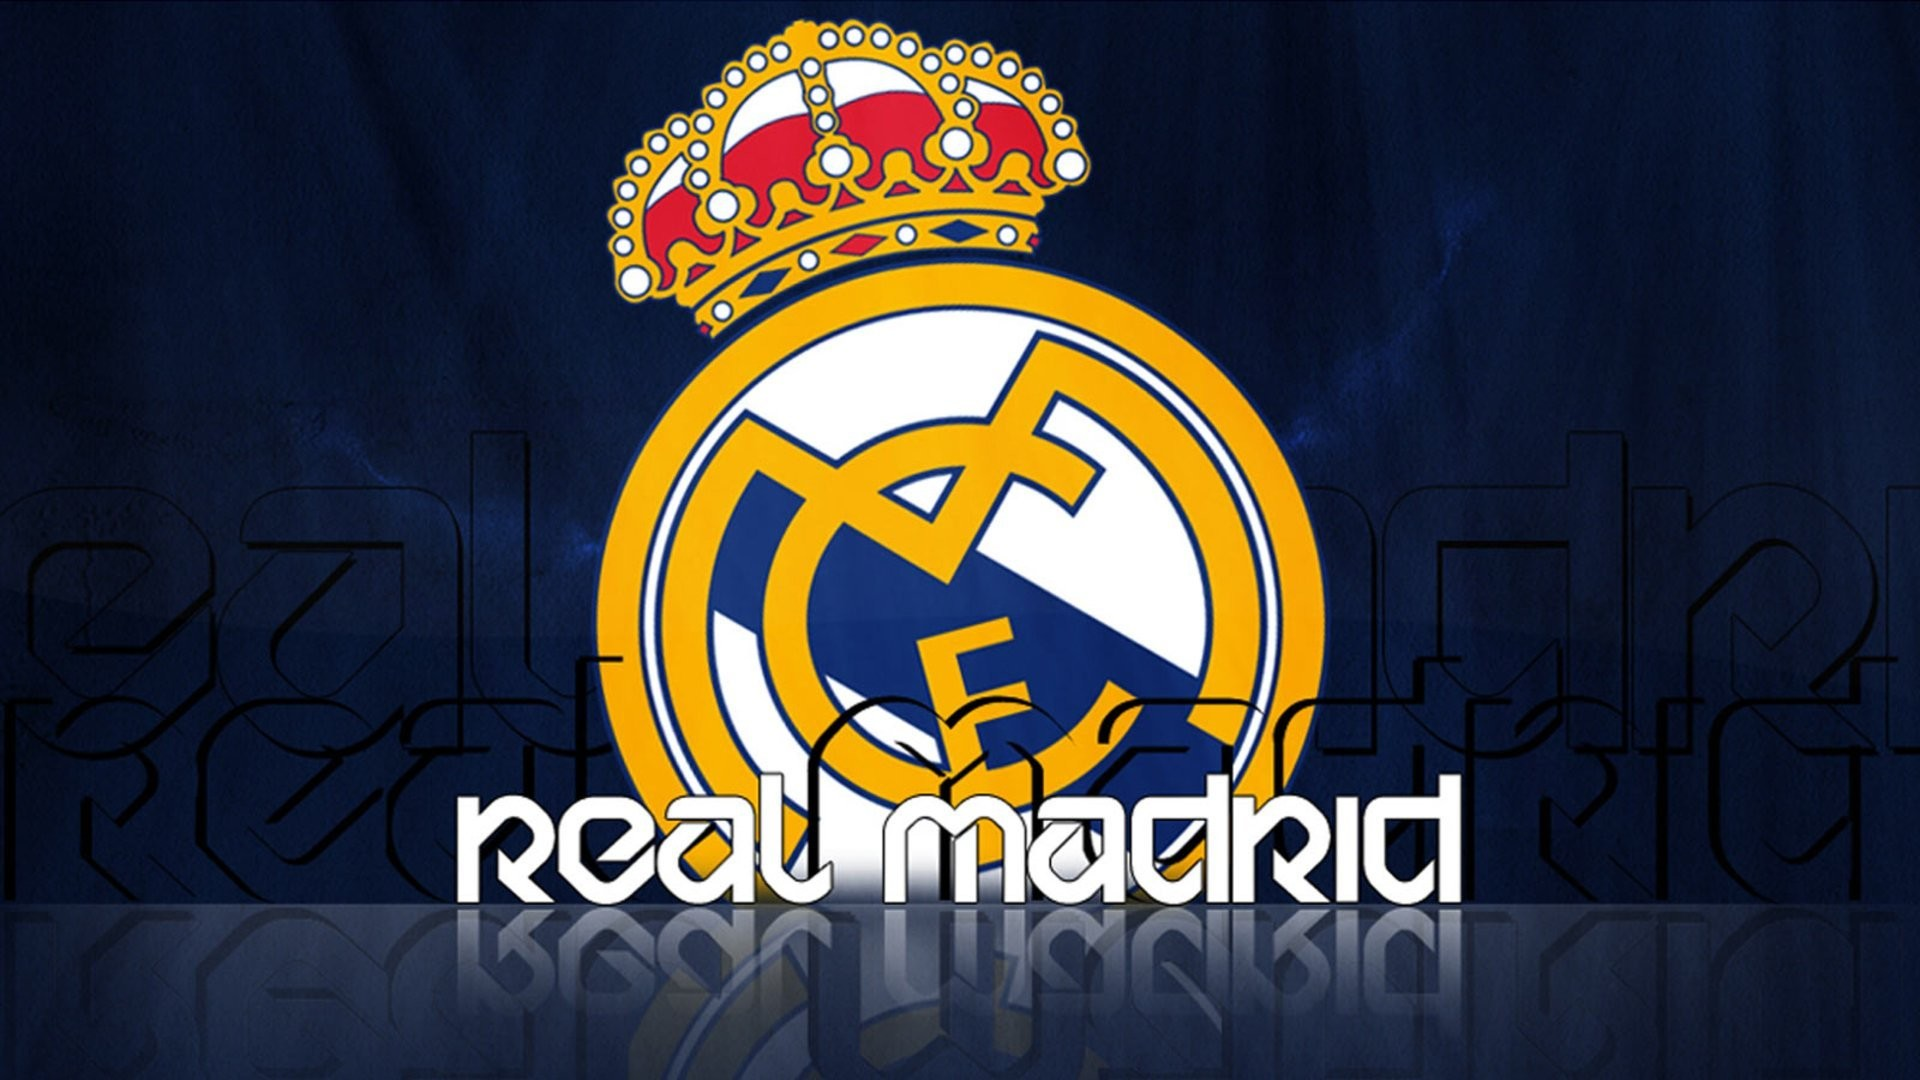 Wallpaper real madrid for windows xp - 1920x1080 Real Madrid Logo Wallpaper Hd